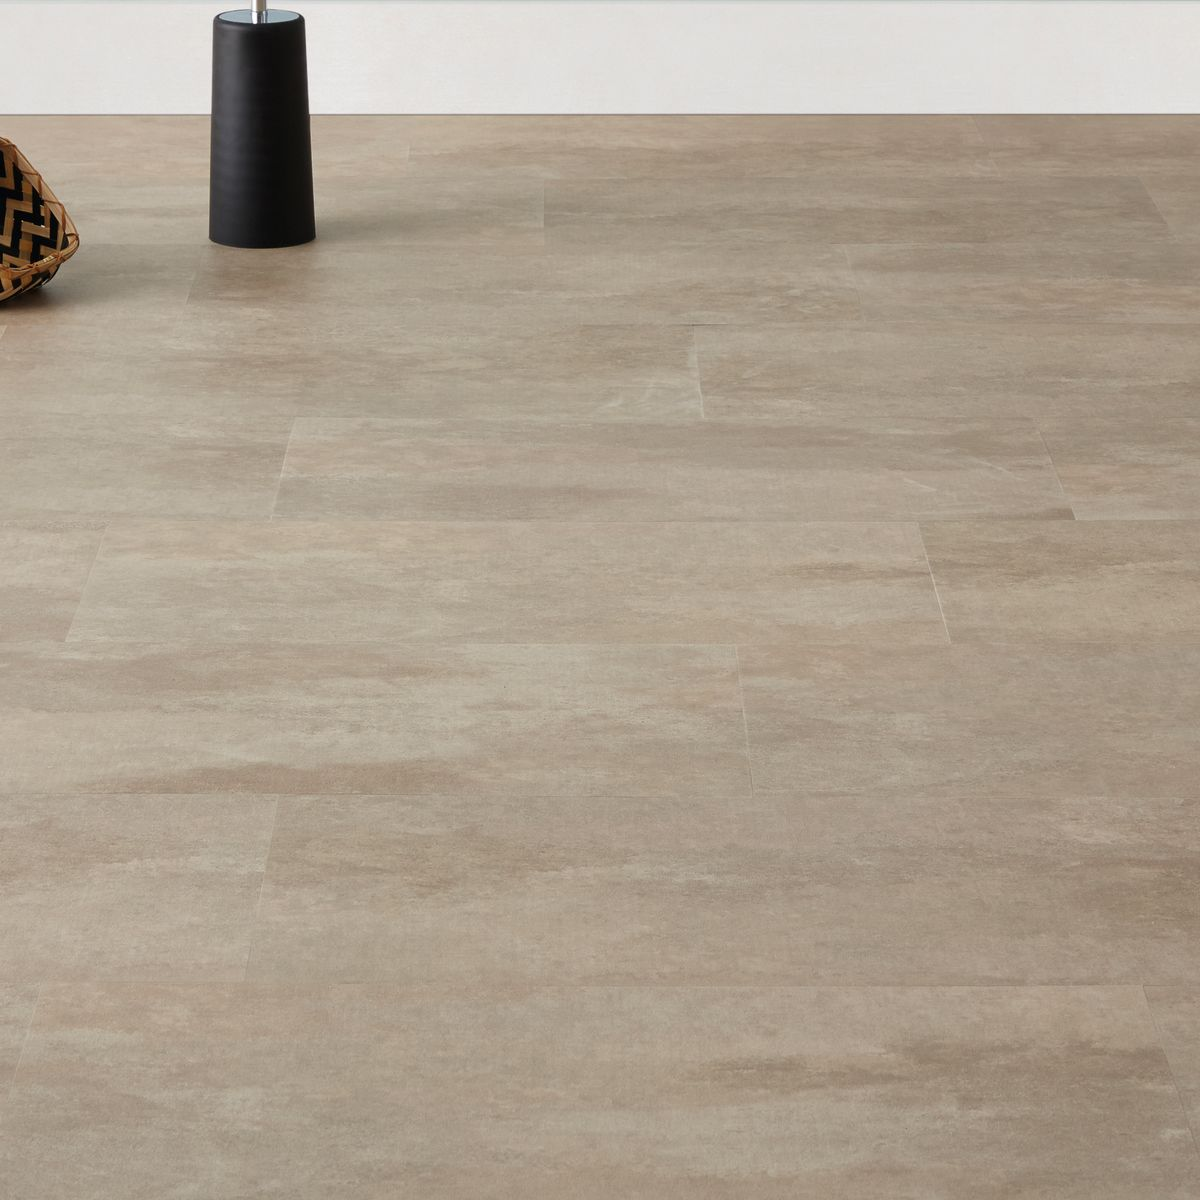 Ikea pavimenti simple pavimento in pvc ikea stunning for Pavimenti pvc ikea